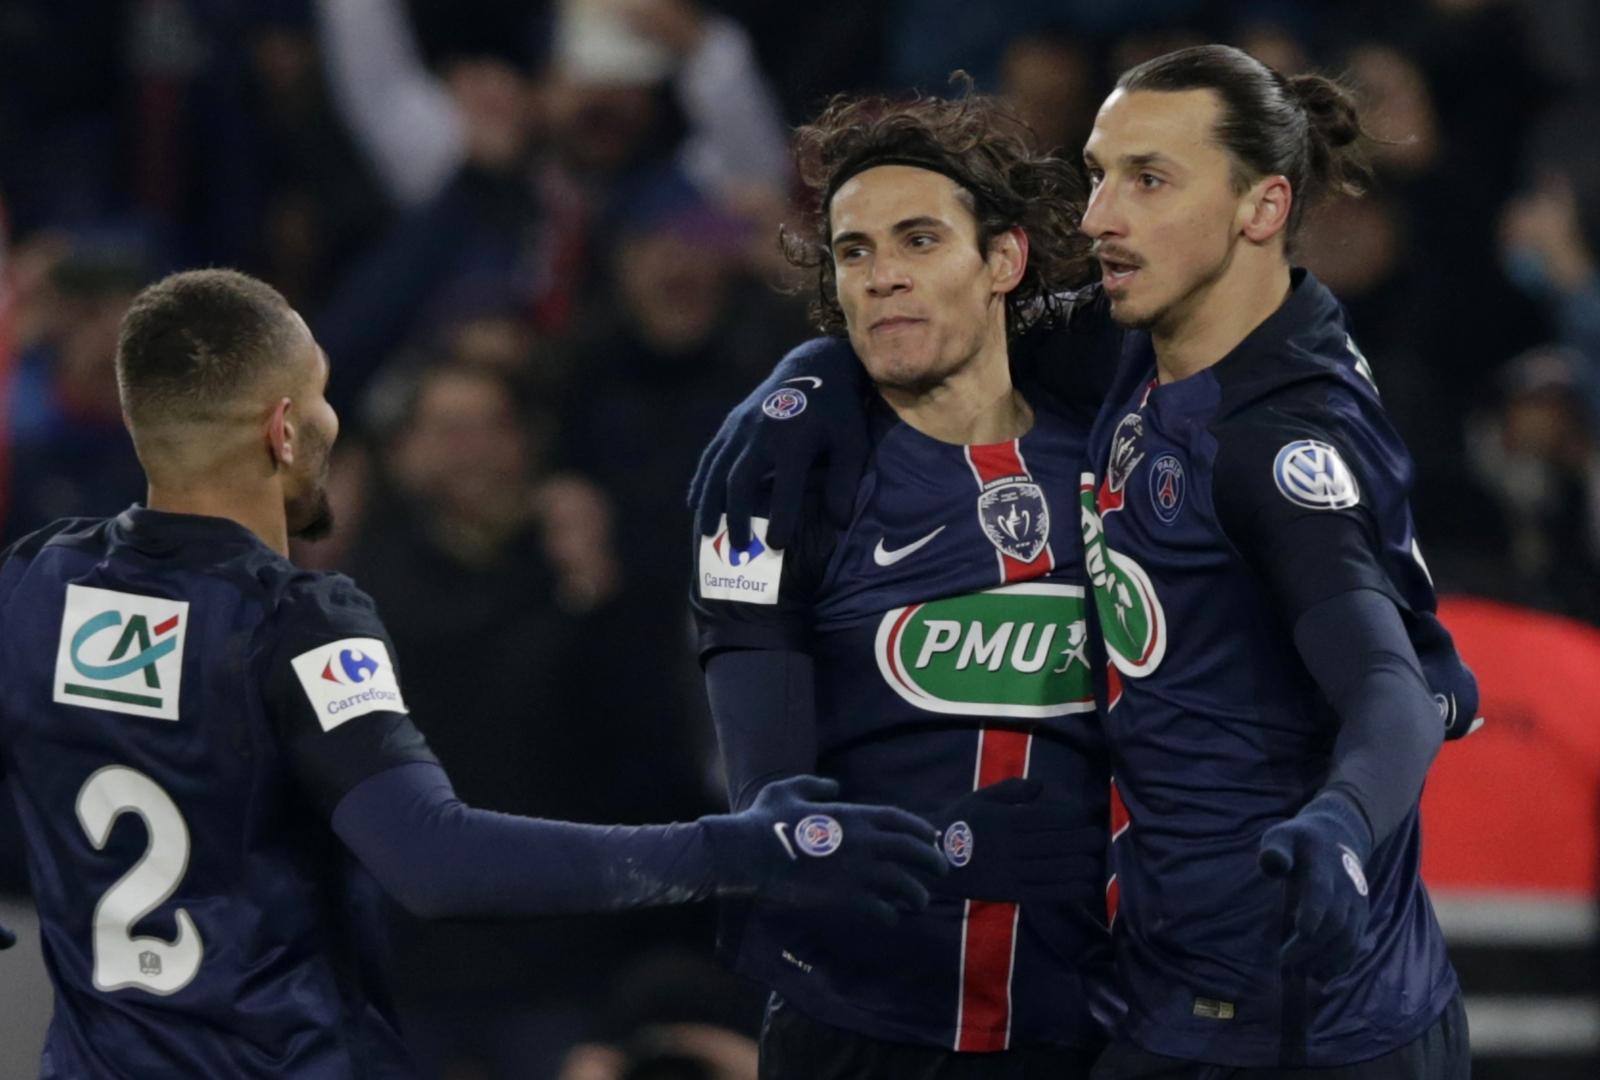 Edinson Cavani and Zlatan Ibrahimovic